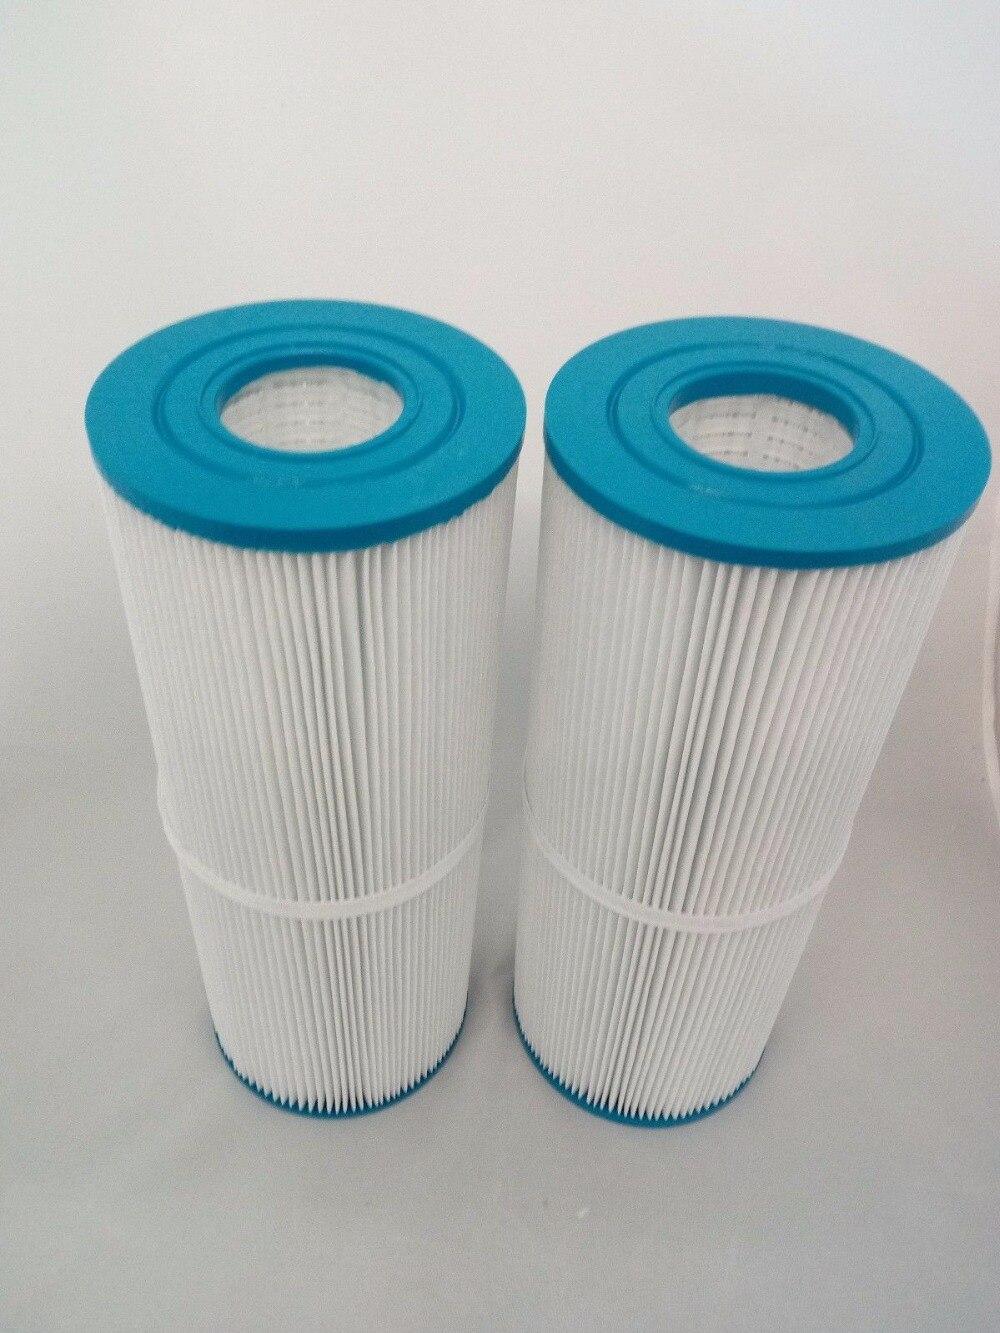 2 PCS spa pool filter 33.6x12.5x5.4cm fit Norway Sweden netherlands switzerland australia hot tubs